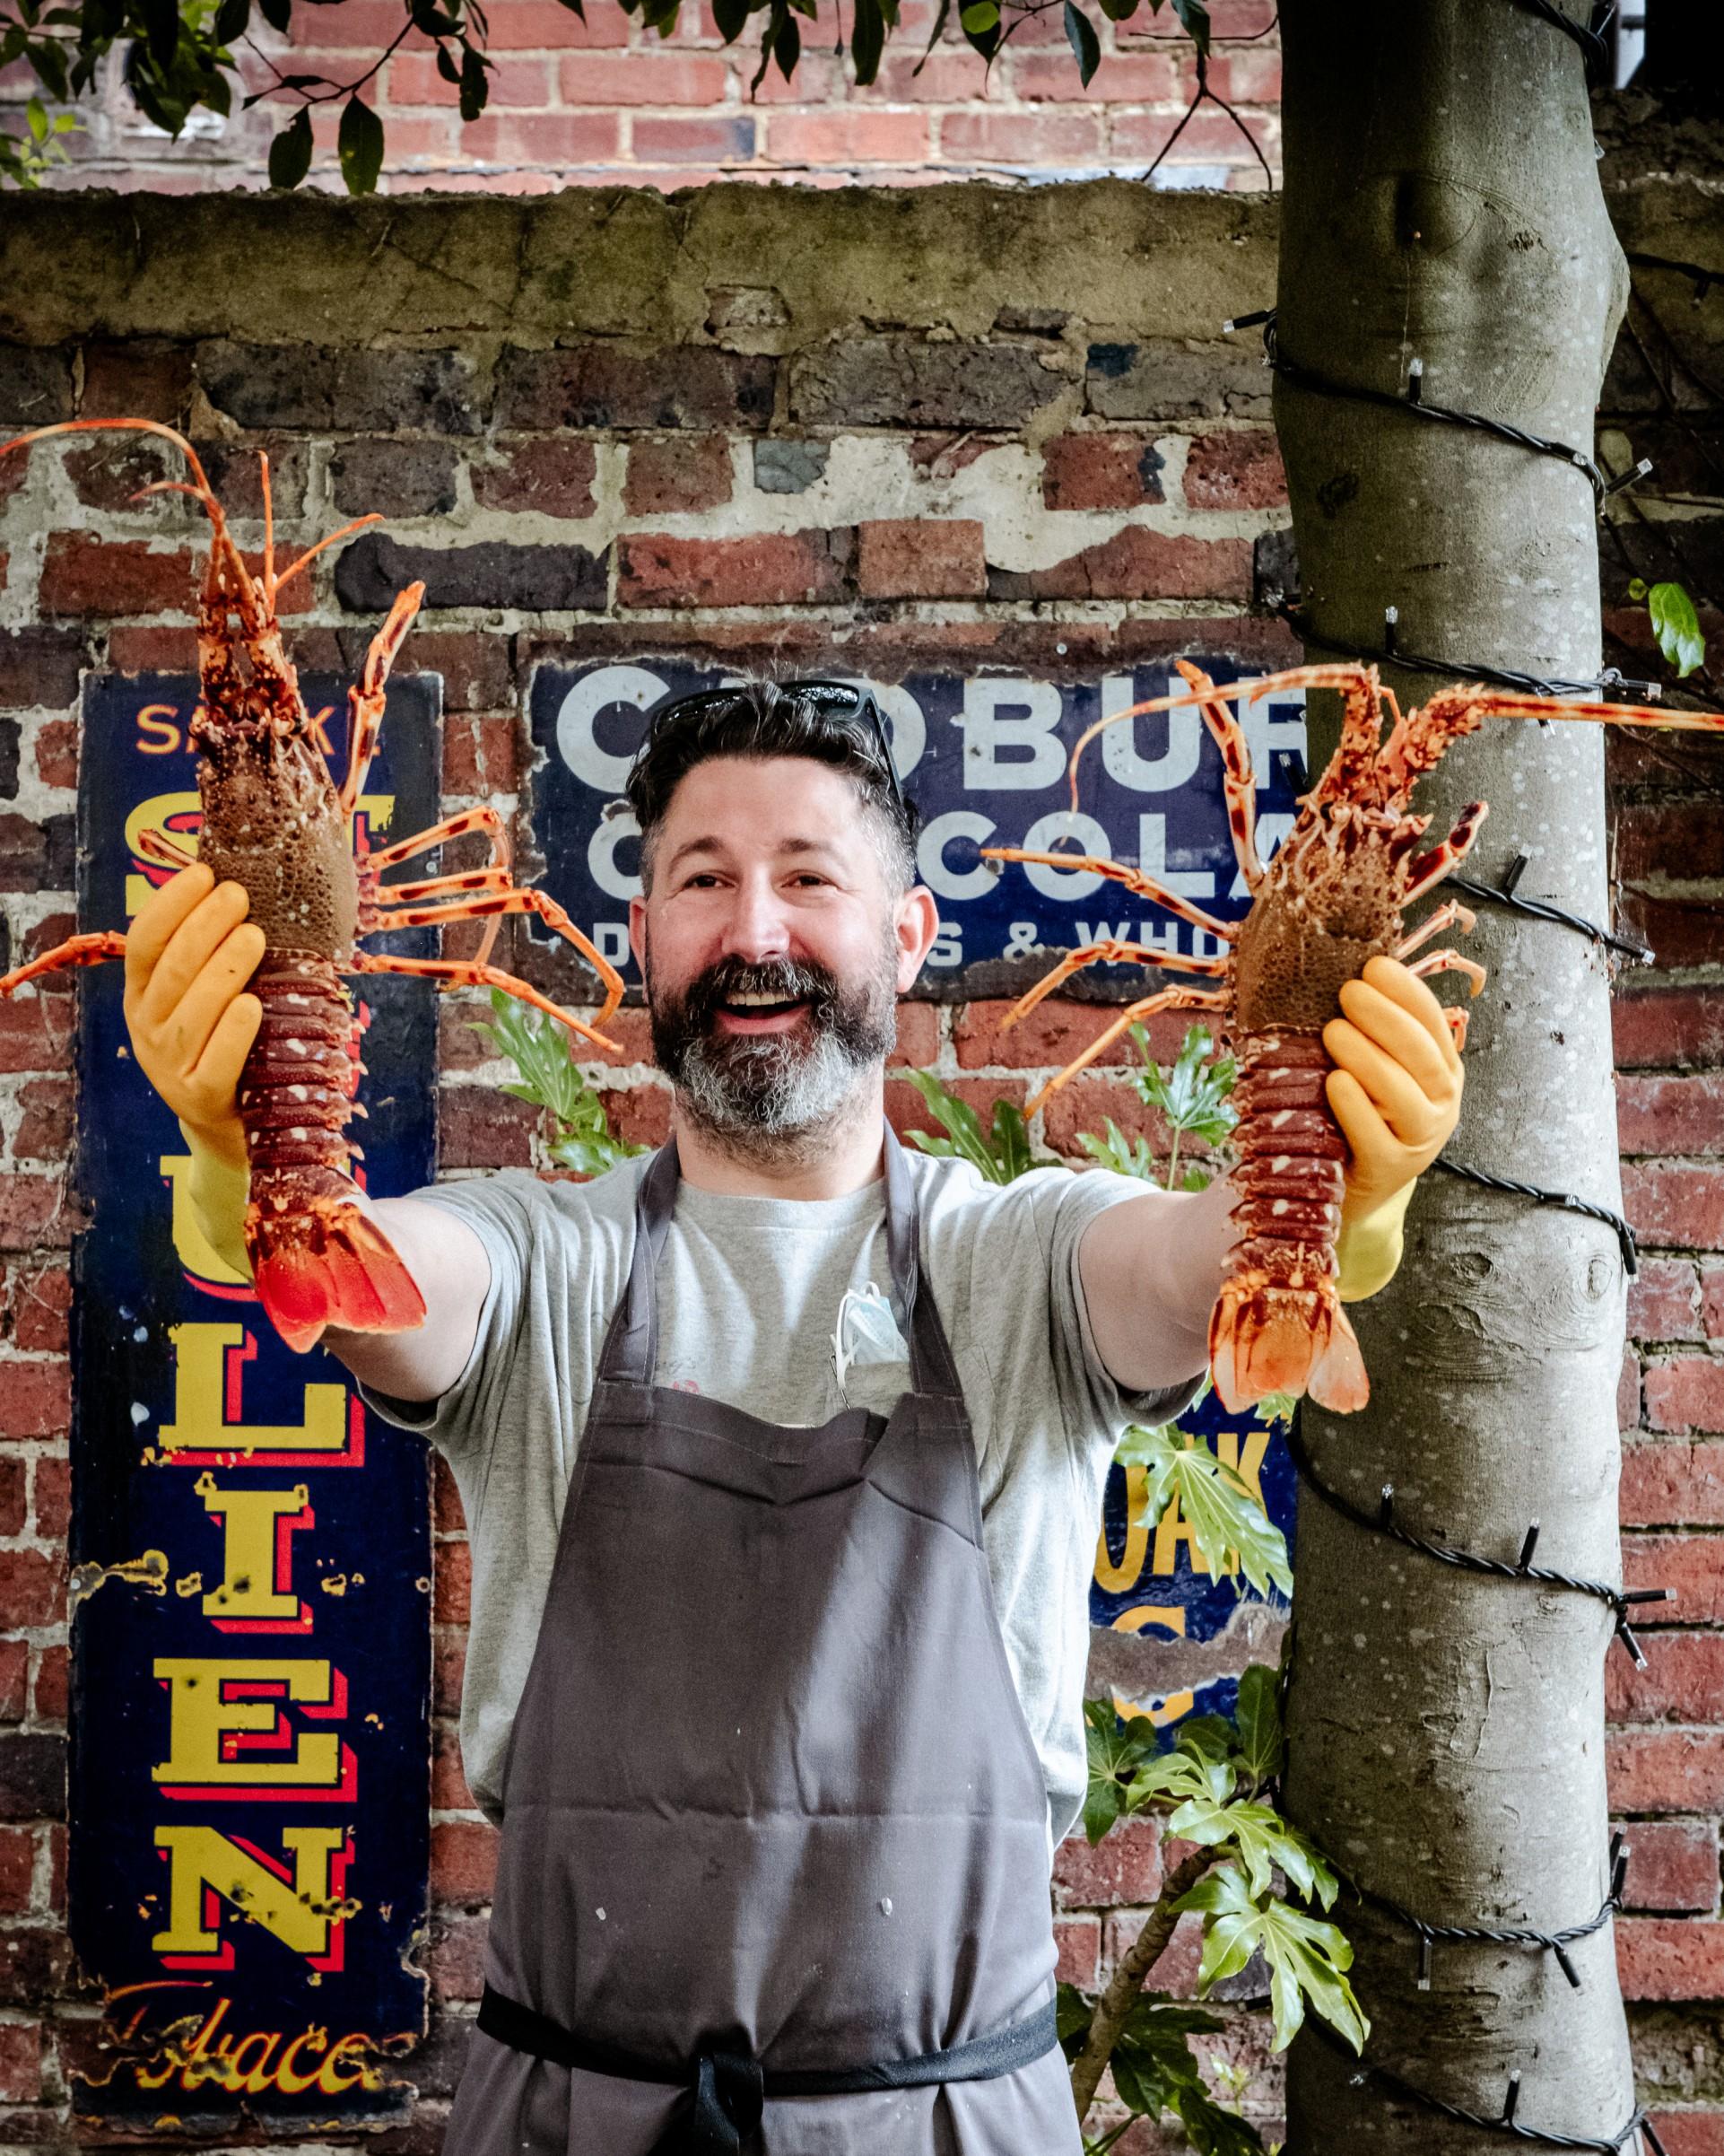 Crawfish is on the menu at Sankey's